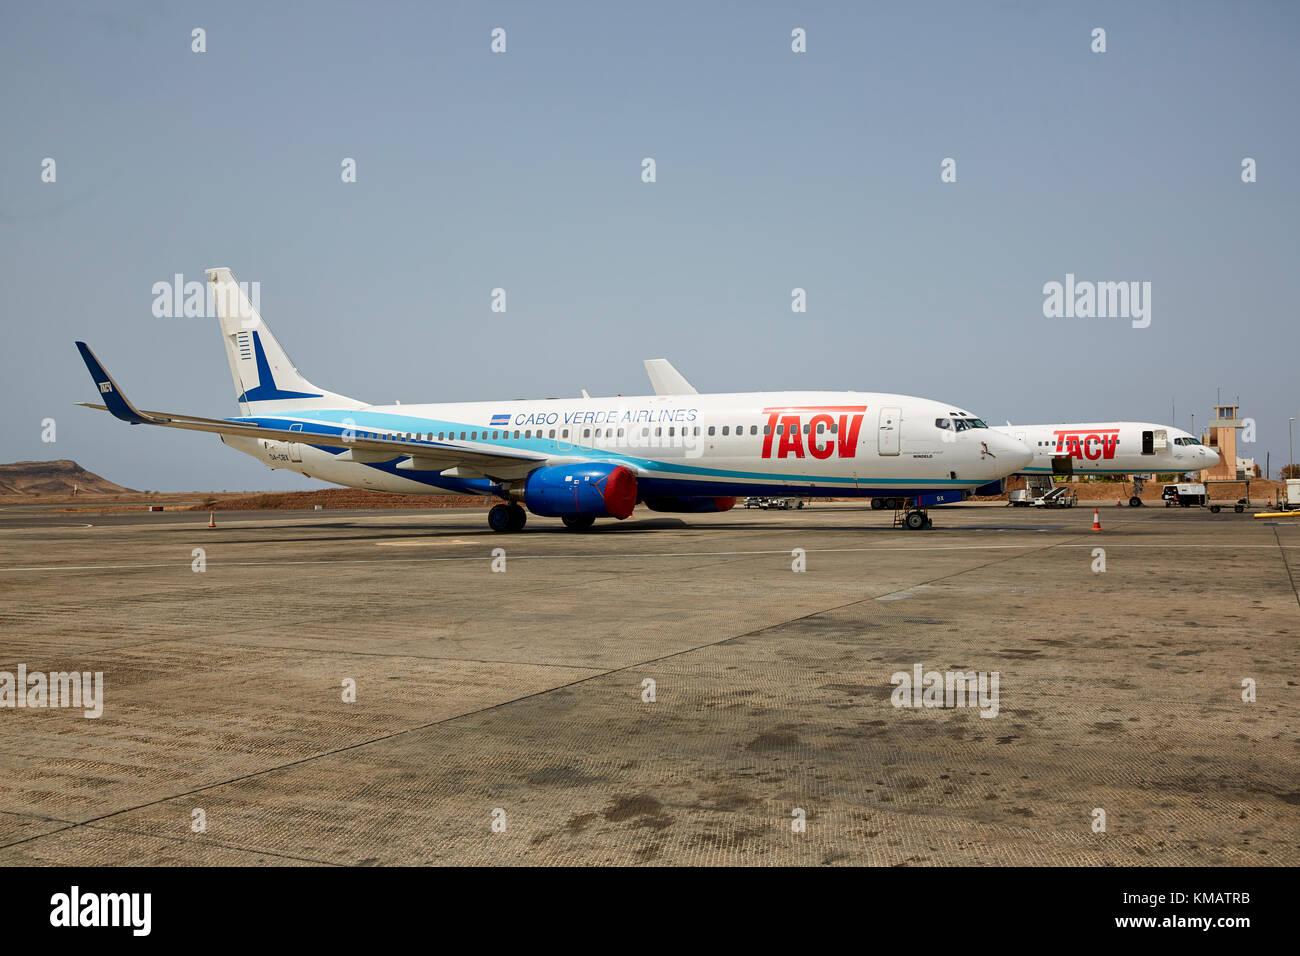 TACV Cabo Verde Airlines, Cape Verdan Airlines, Boeing 737, Santiago, Cape Verde (Cabo Verde) - Stock Image